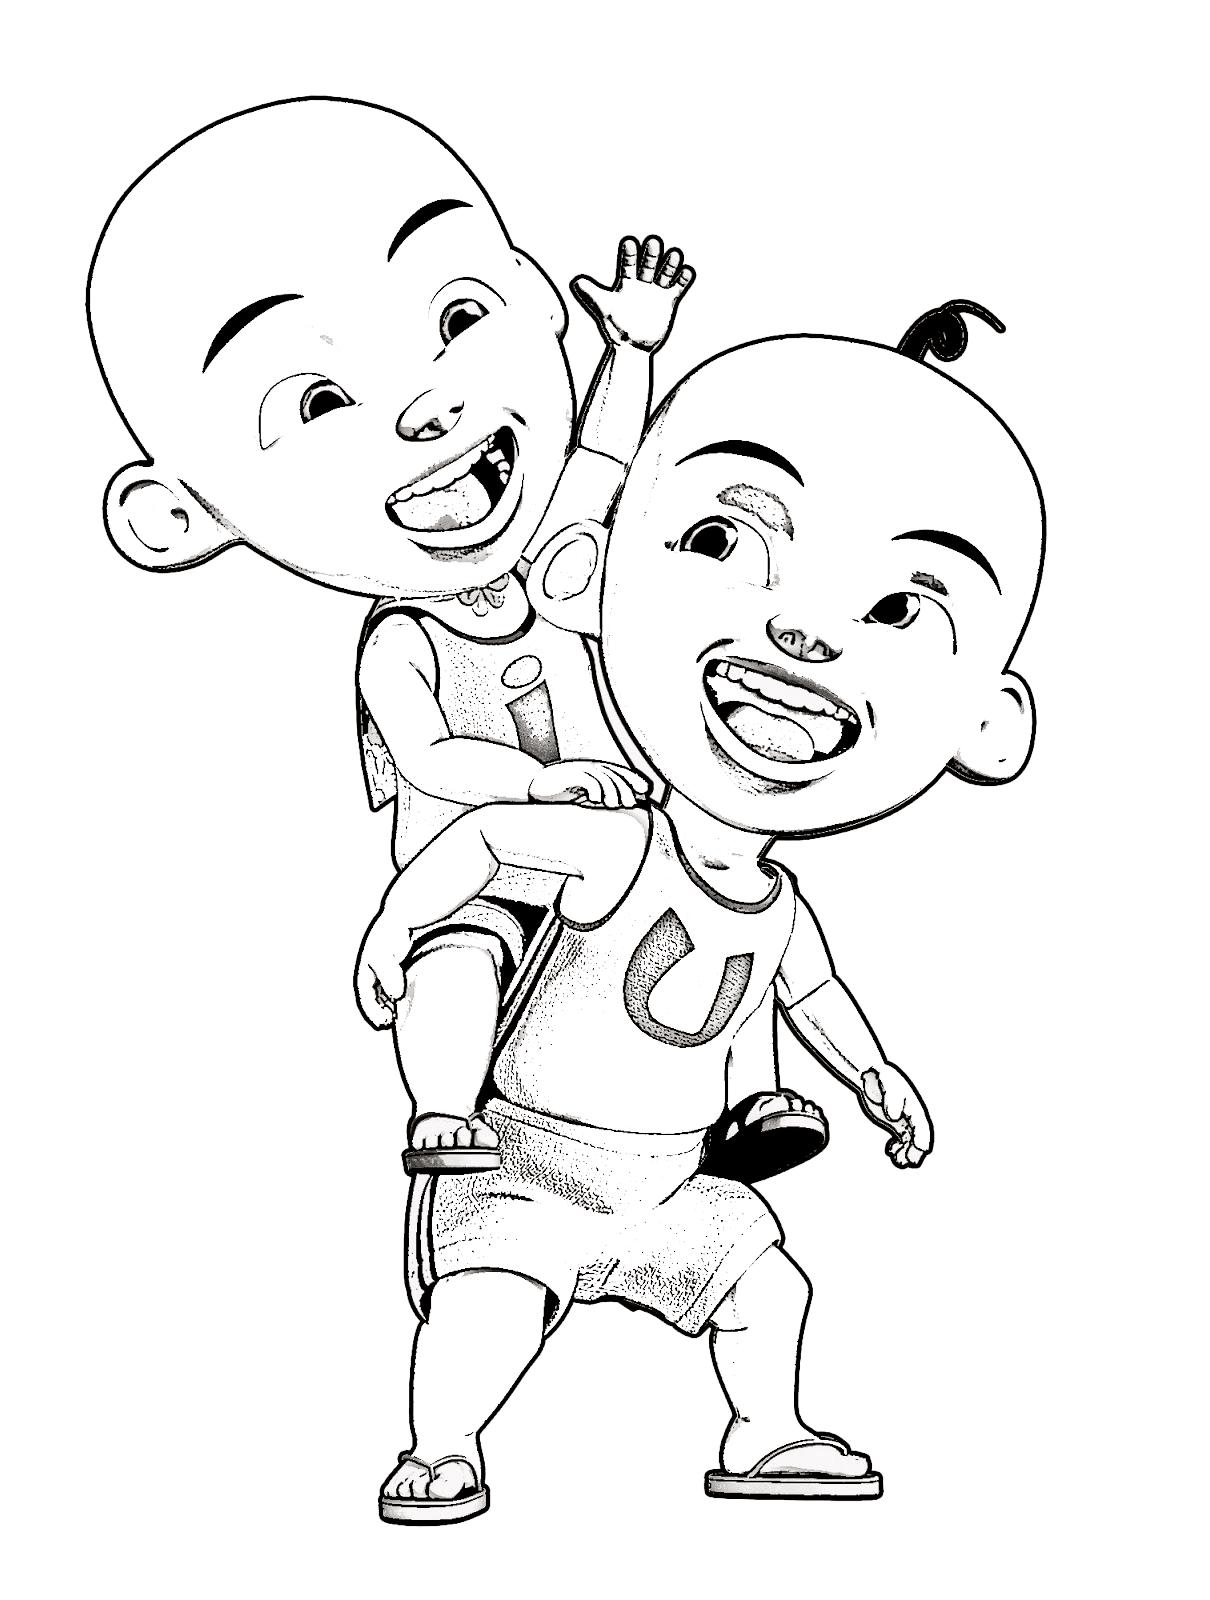 32 Gambar Kartun Upin Dan Ipin Hitam Putih Gambar Kartun Di 2020 Buku Mewarnai Kartun Gambar